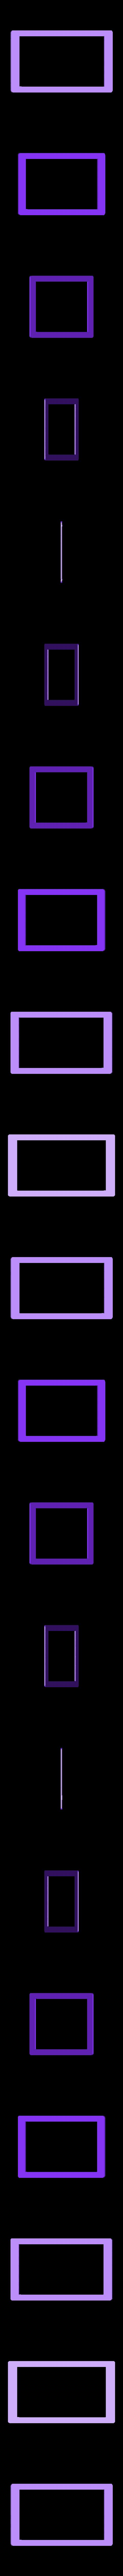 ScreenShape (repaired).stl Download STL file Nintendo switch modèle • 3D print design, Shigeryu